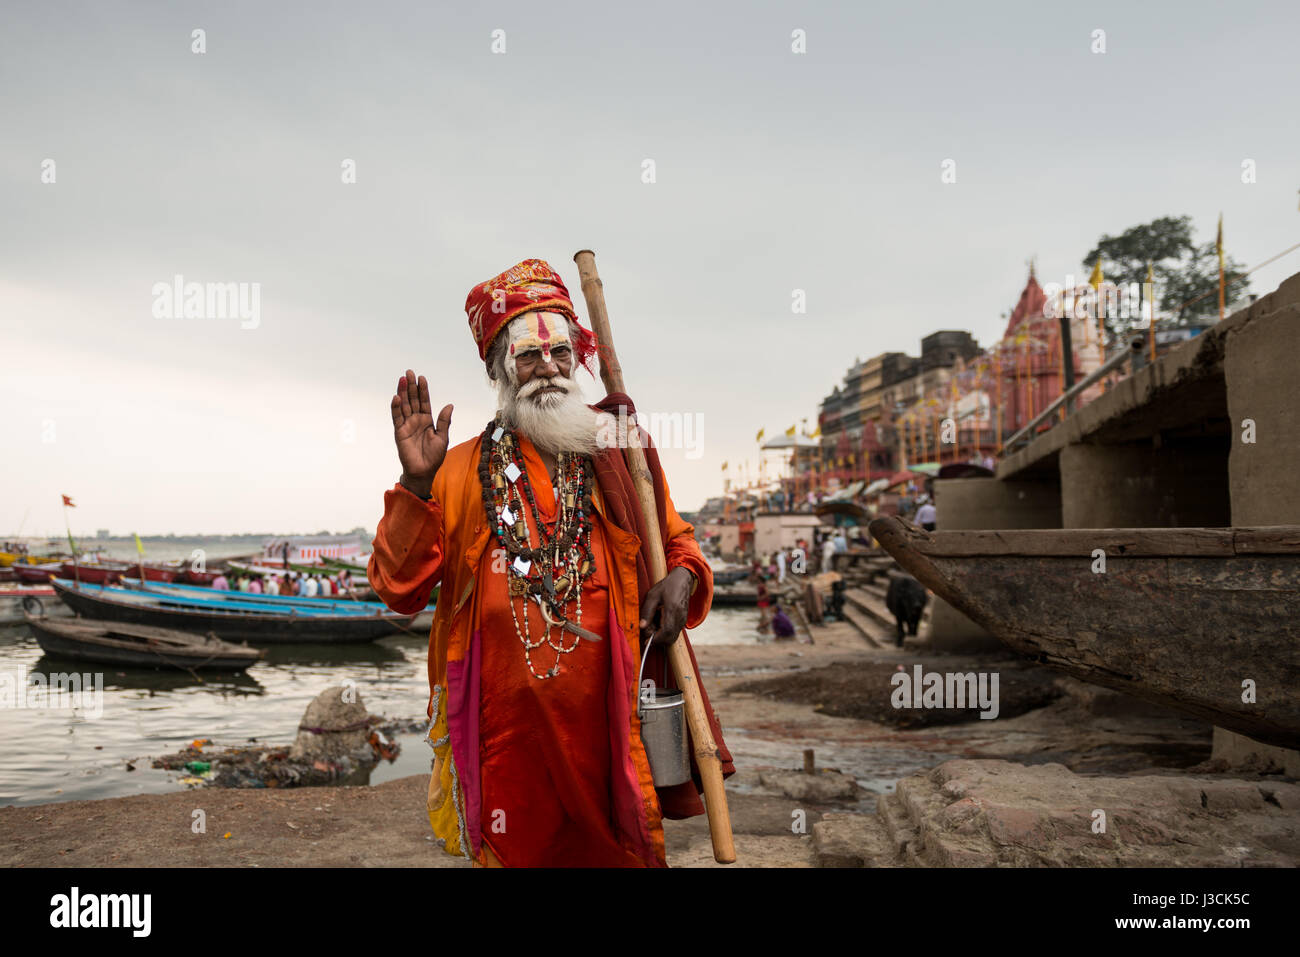 Sadhu in Varanasi, India. - Stock Image